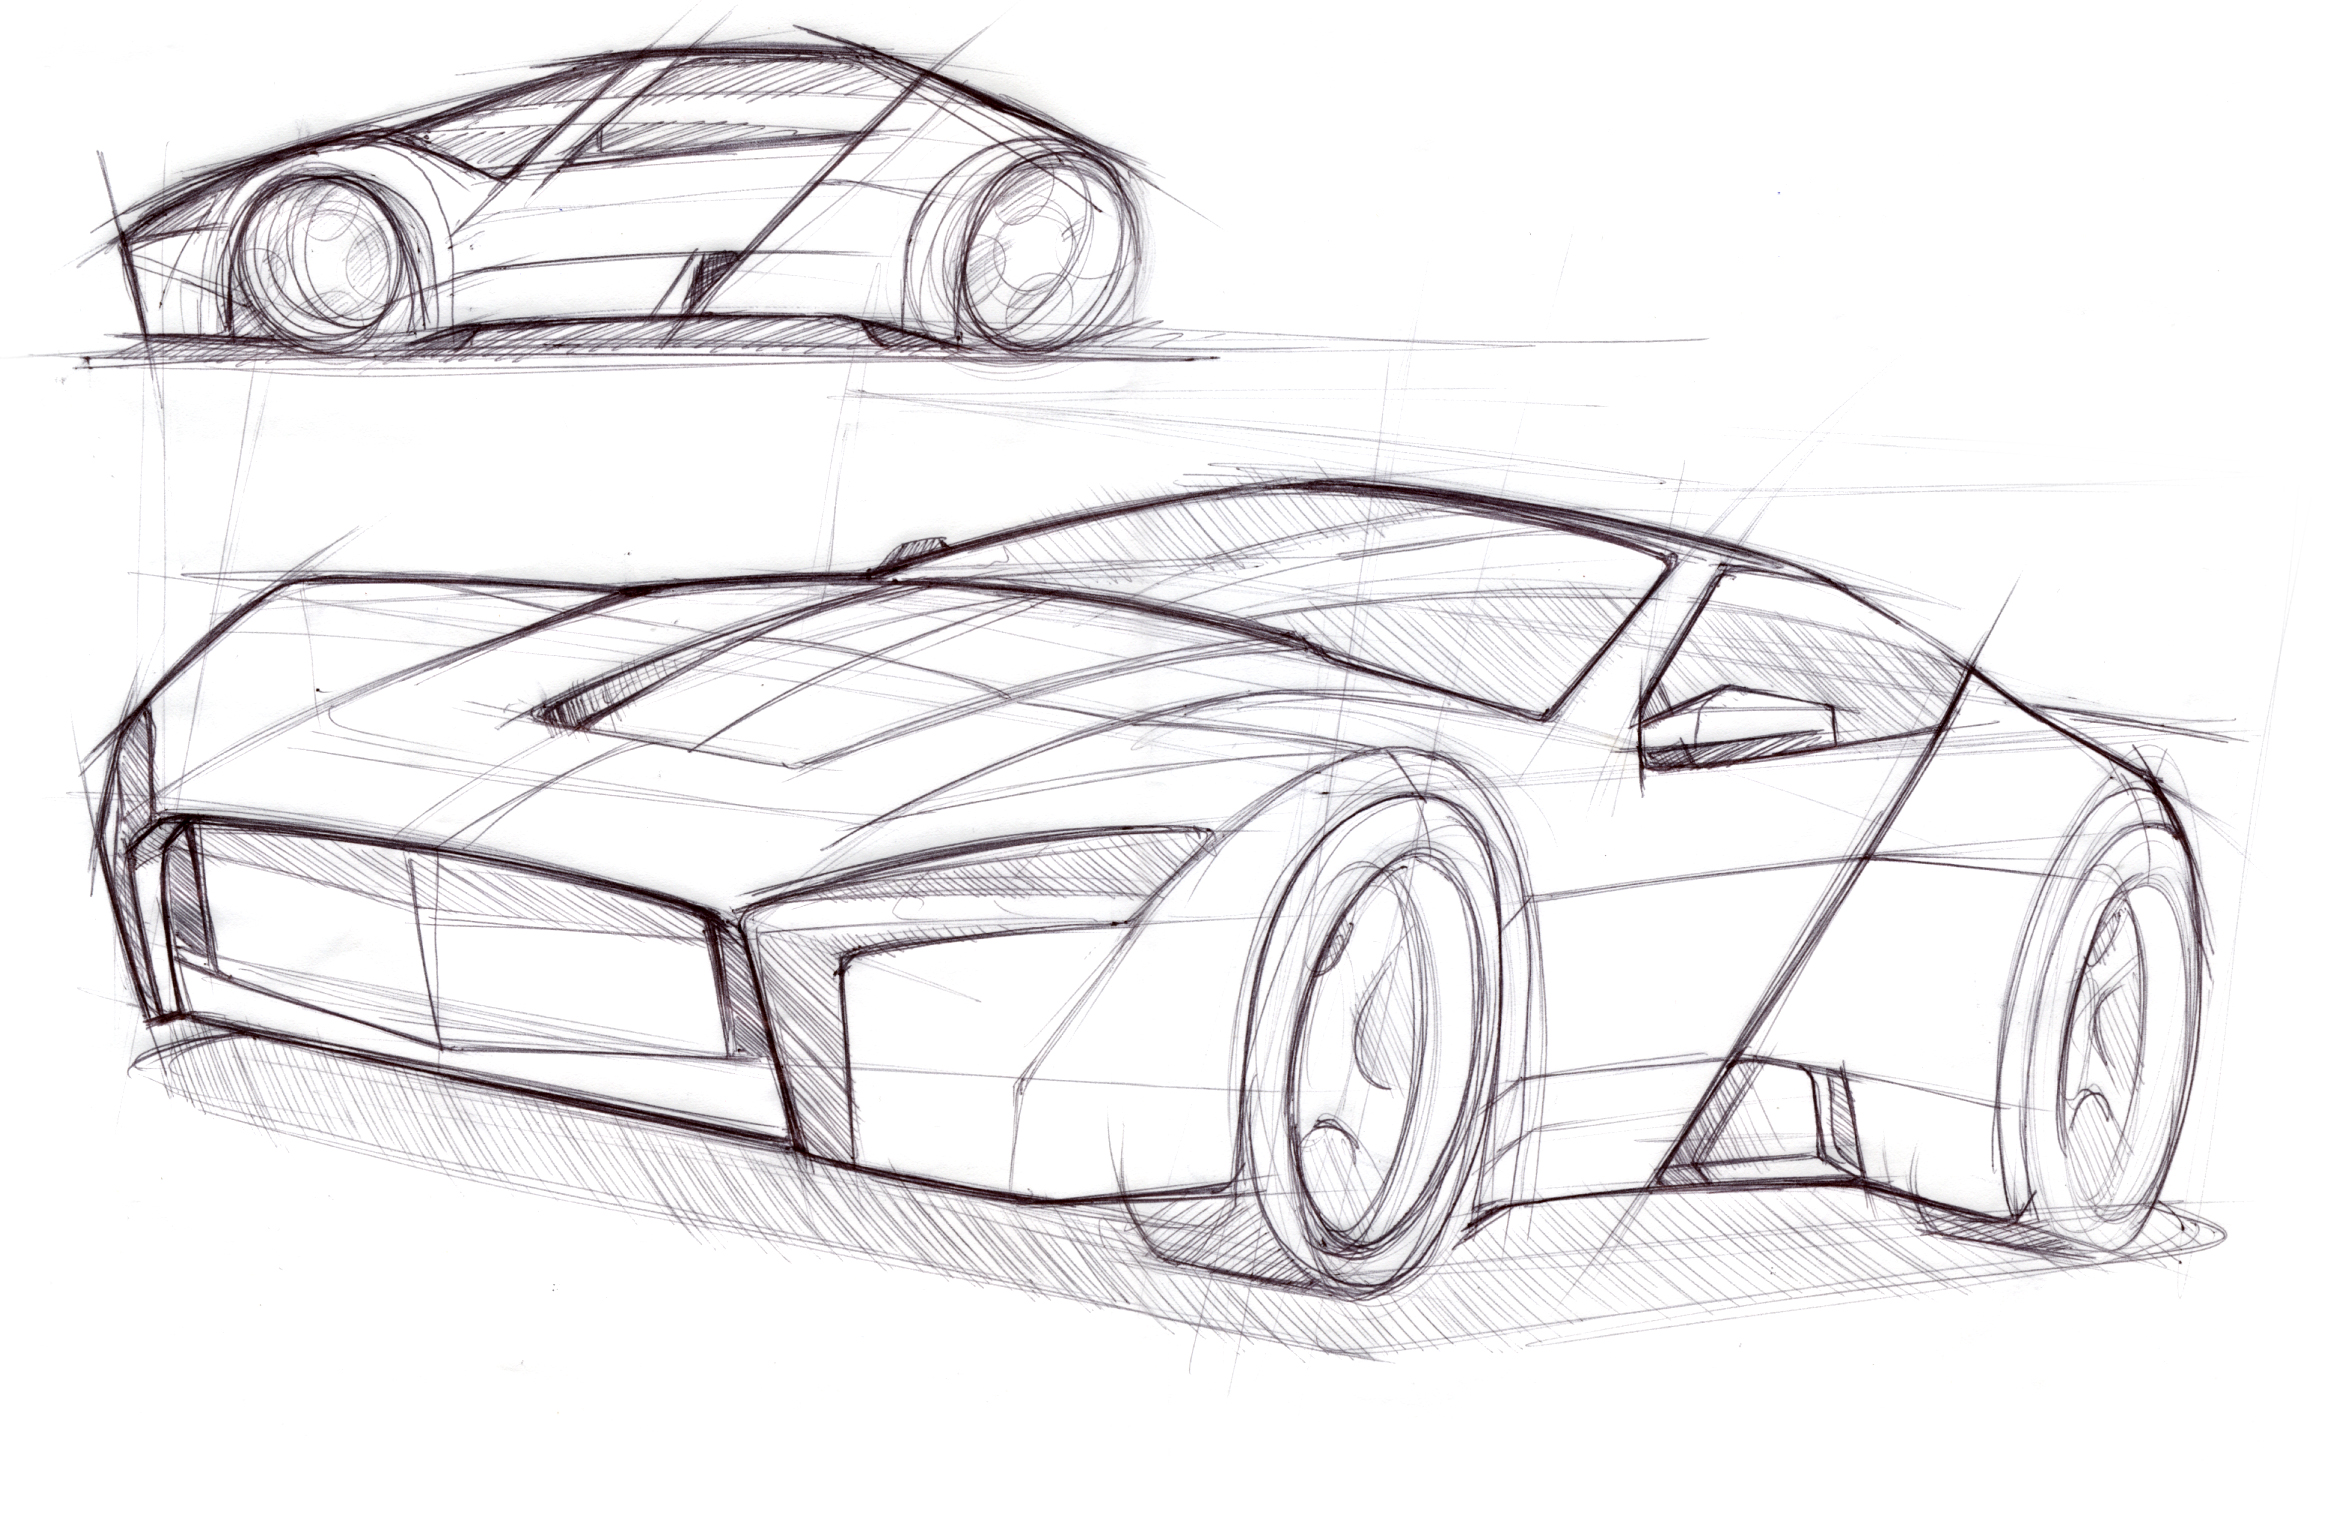 بالصور تصميم سيارات , رسومات سيارات جميله 6664 11